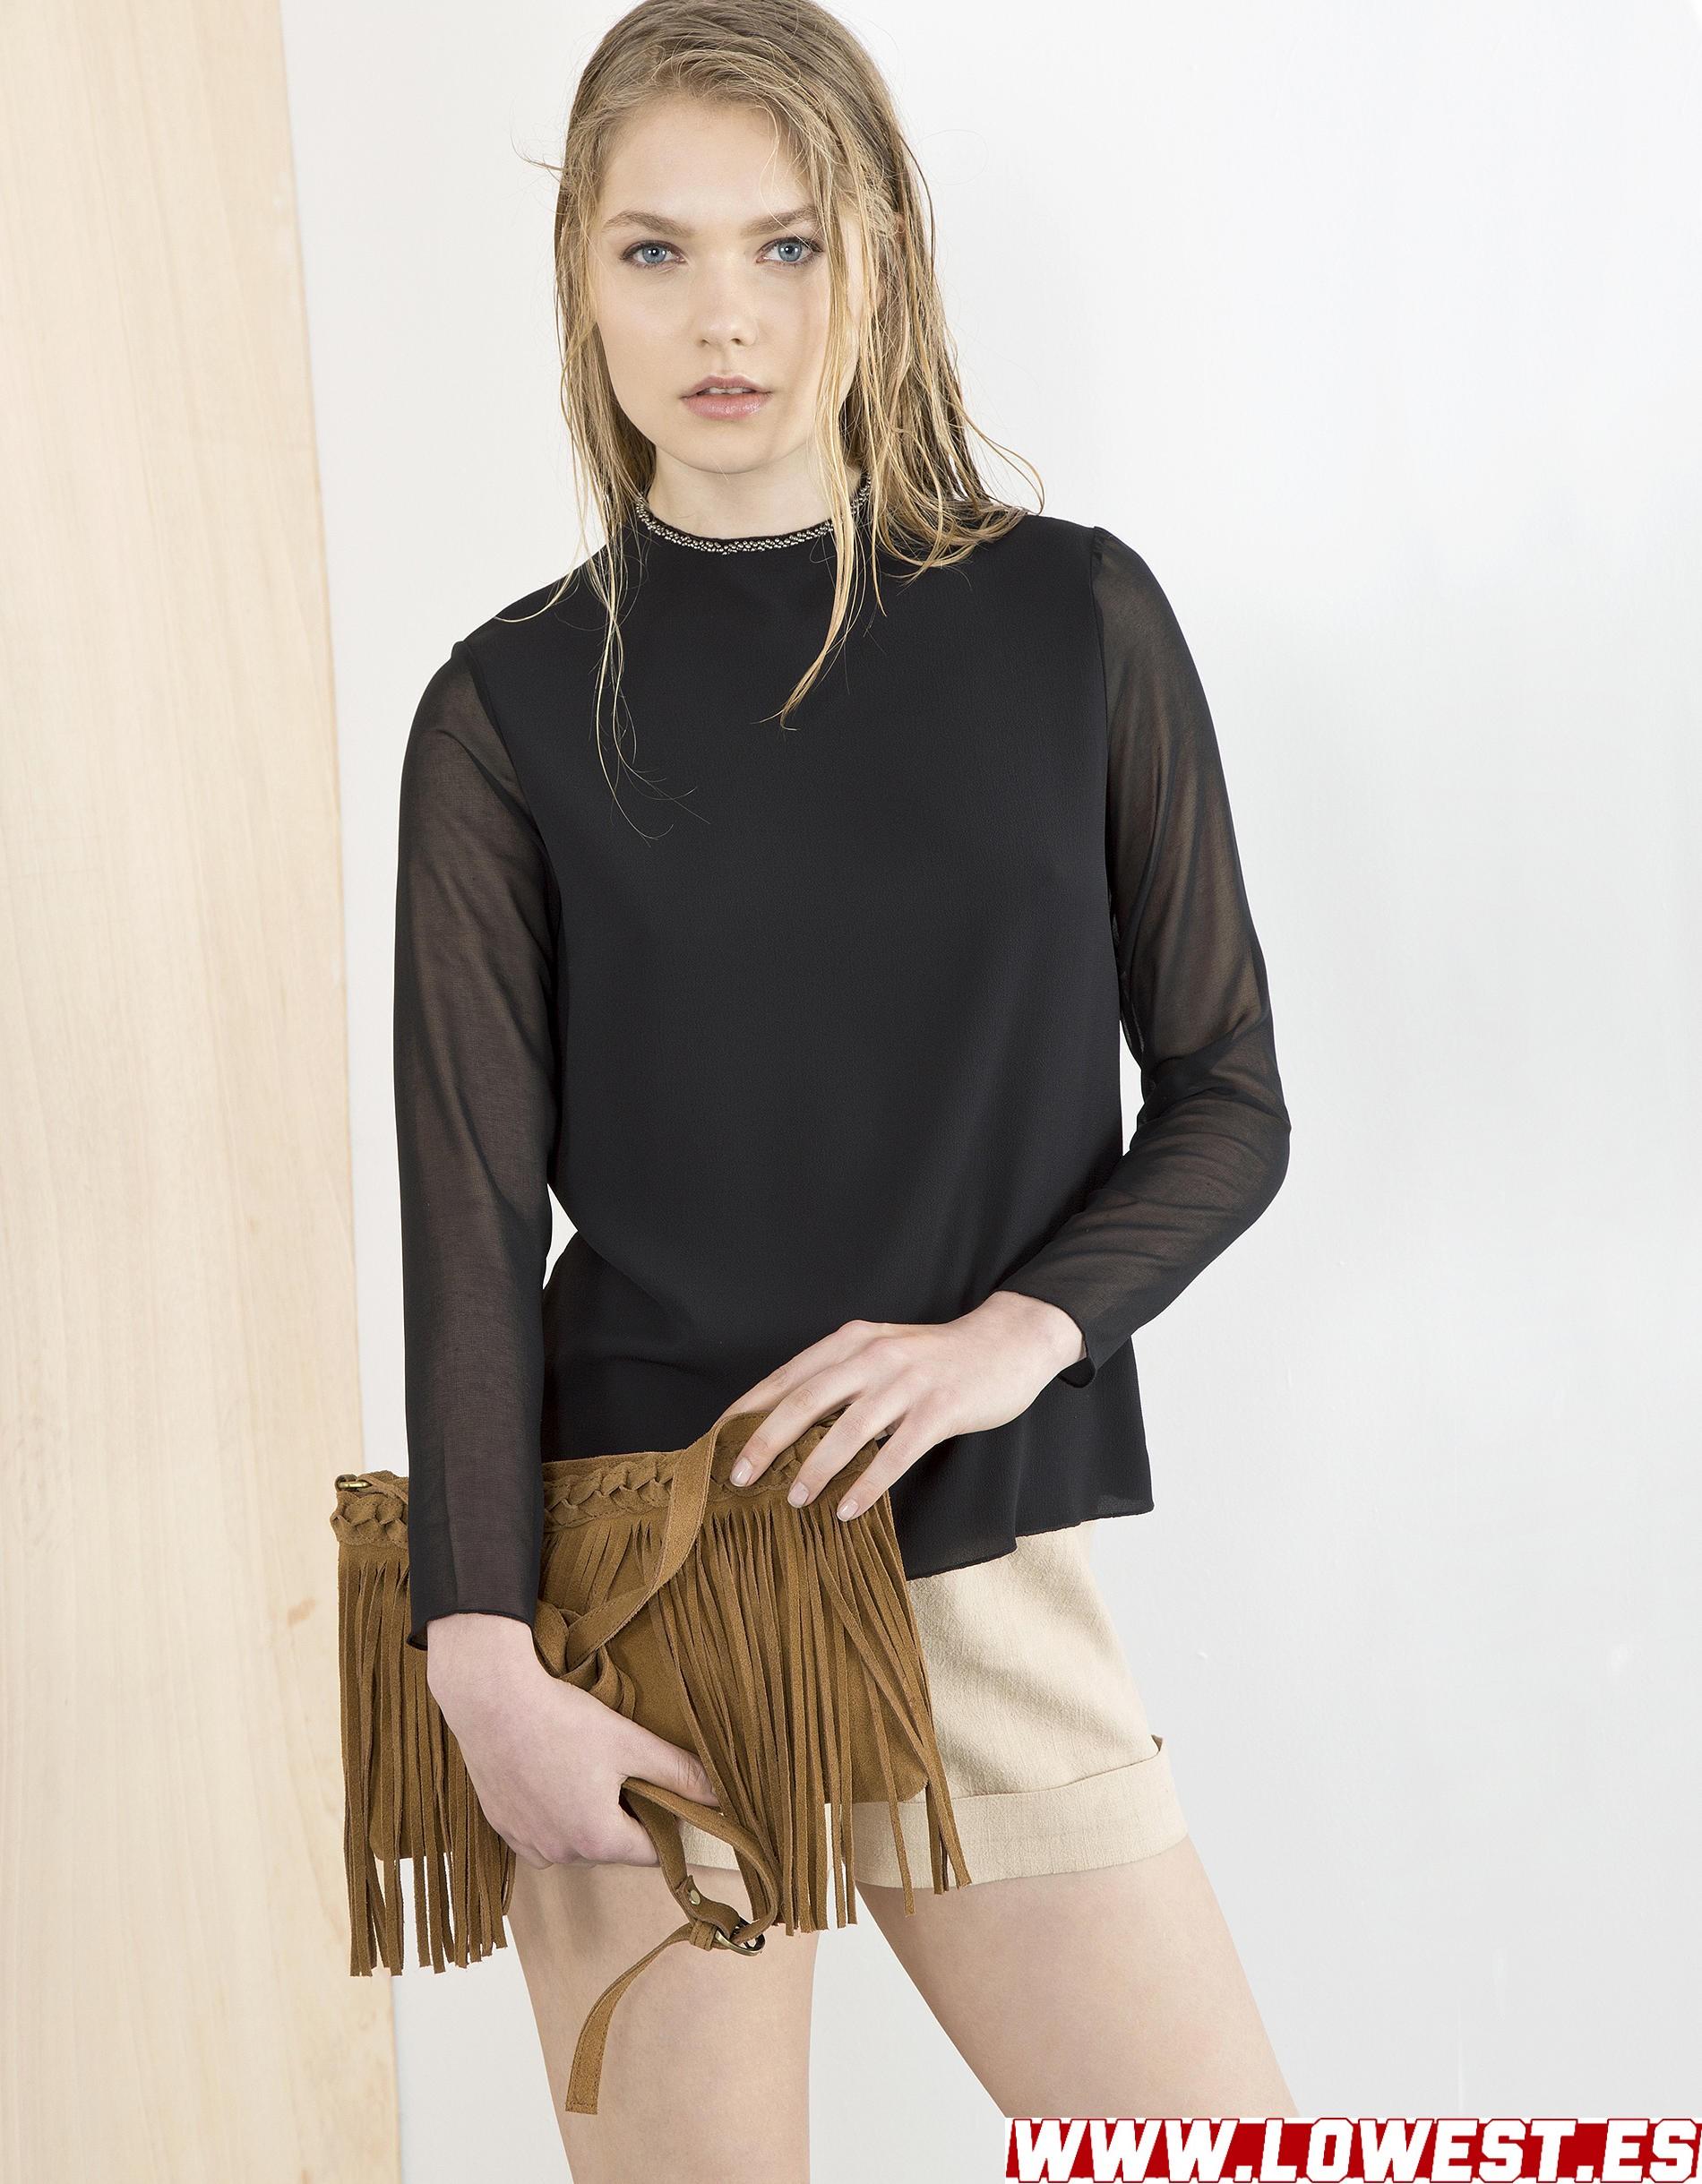 moda de mujer Lowest vestido negro 2019 2020